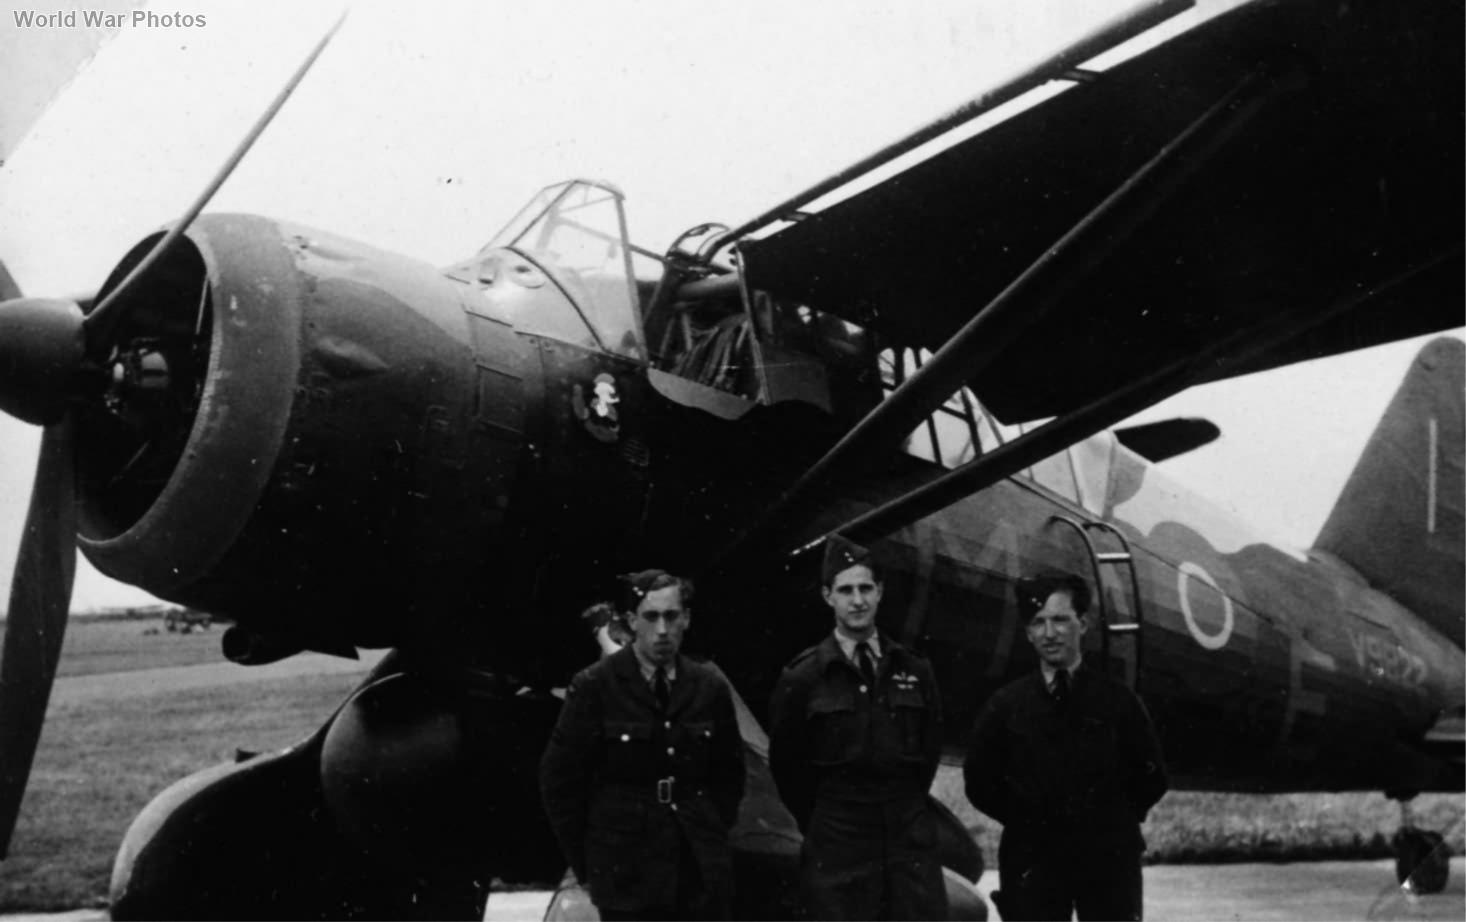 Lysander Mk IIIA V9822 MA-E of No. 161 (Special Duties) Squadron RAF